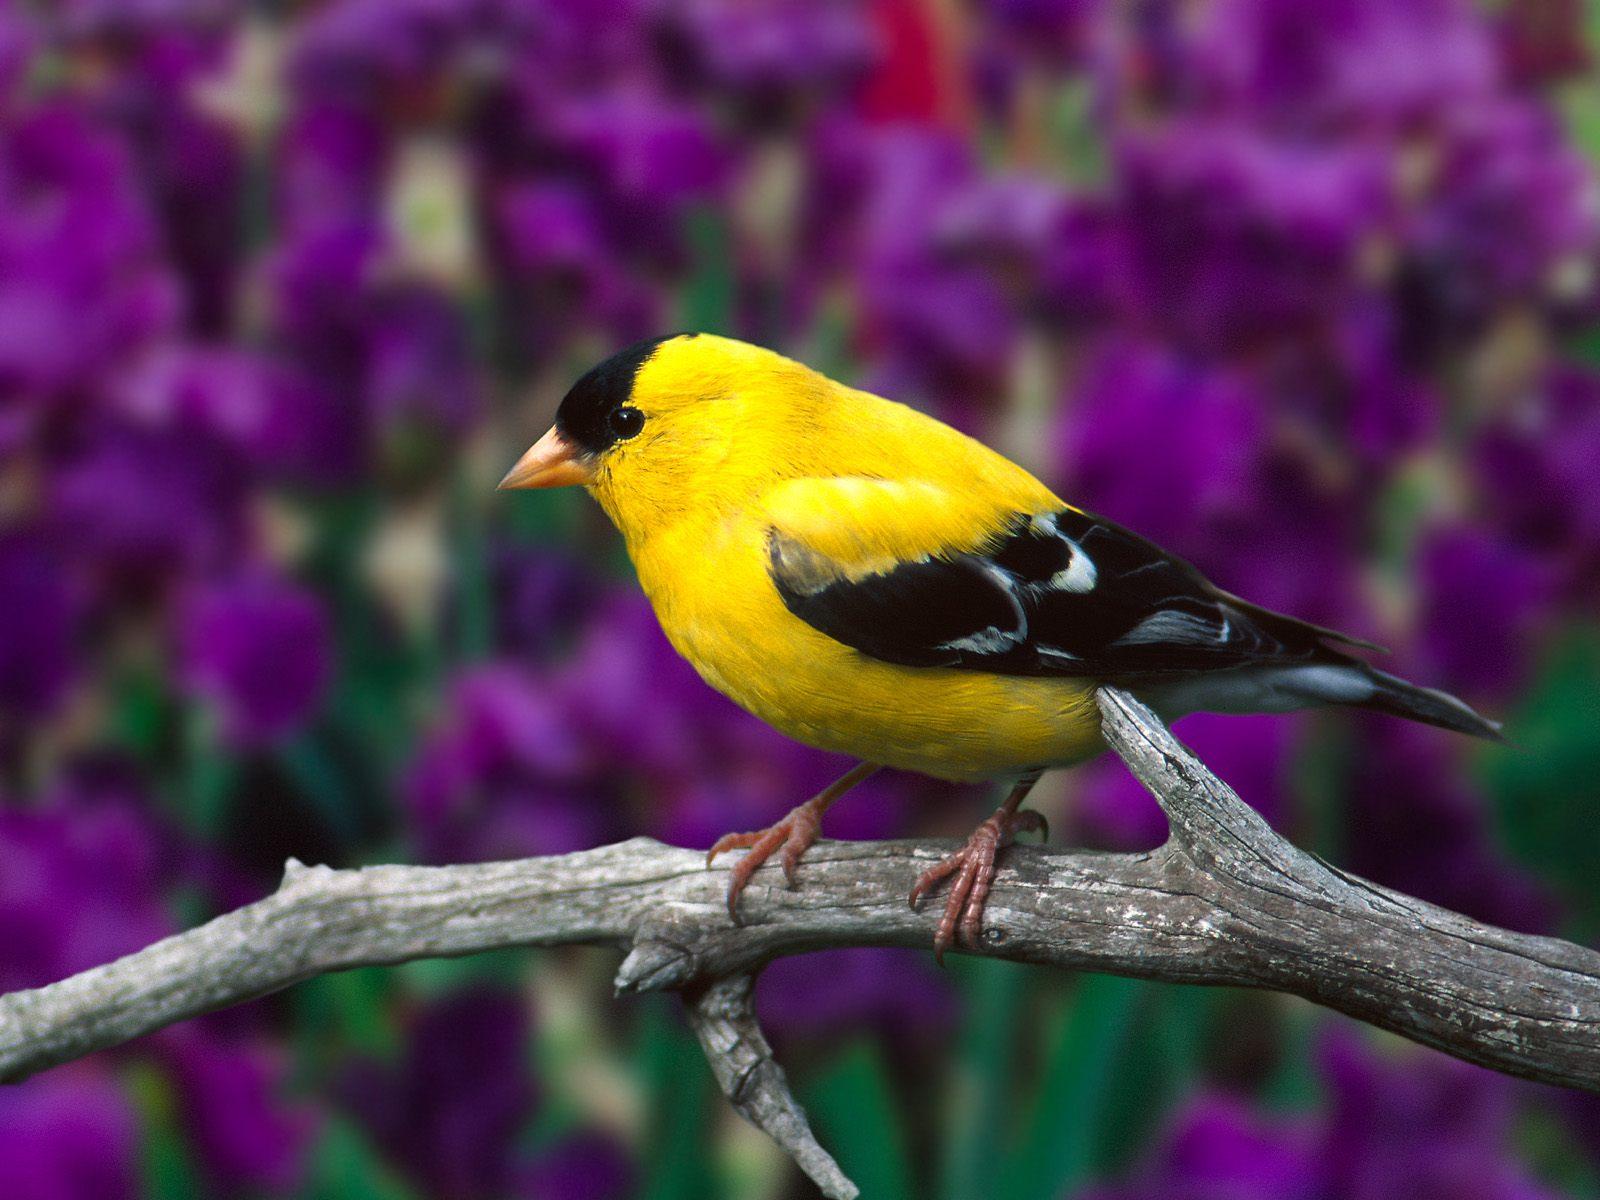 YELLOW BIRD ON TREE BRANCH WALLPAPER   283   HD Wallpapers 1600x1200